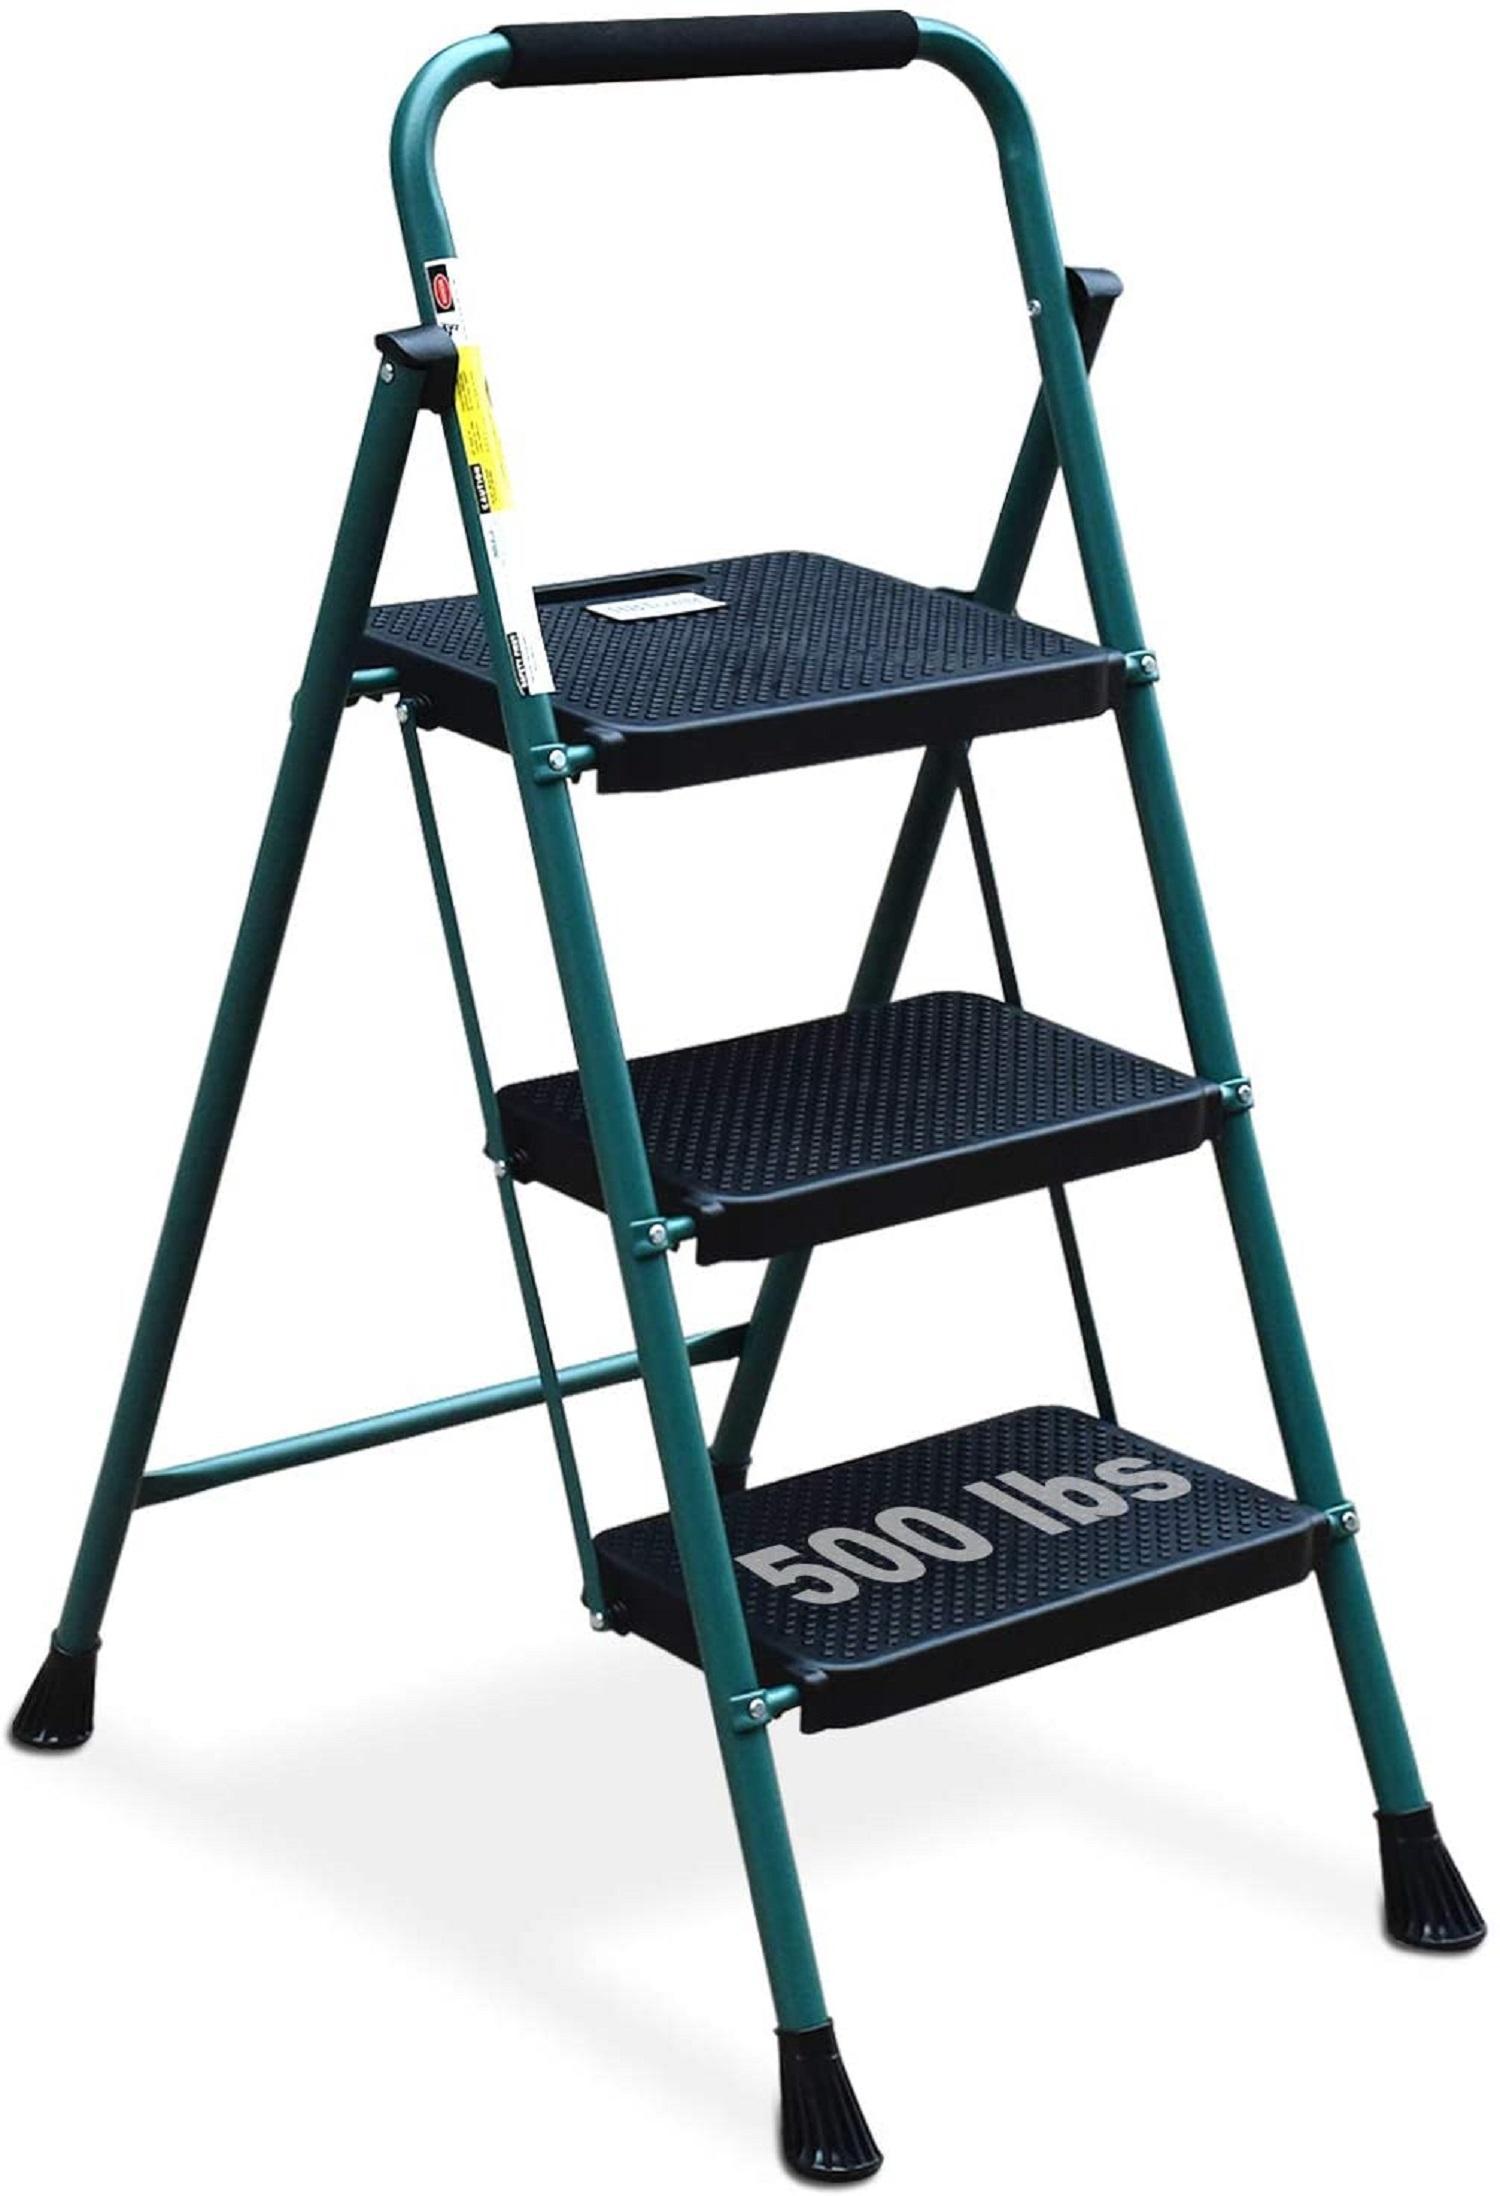 HBTower 3-Step Ladder